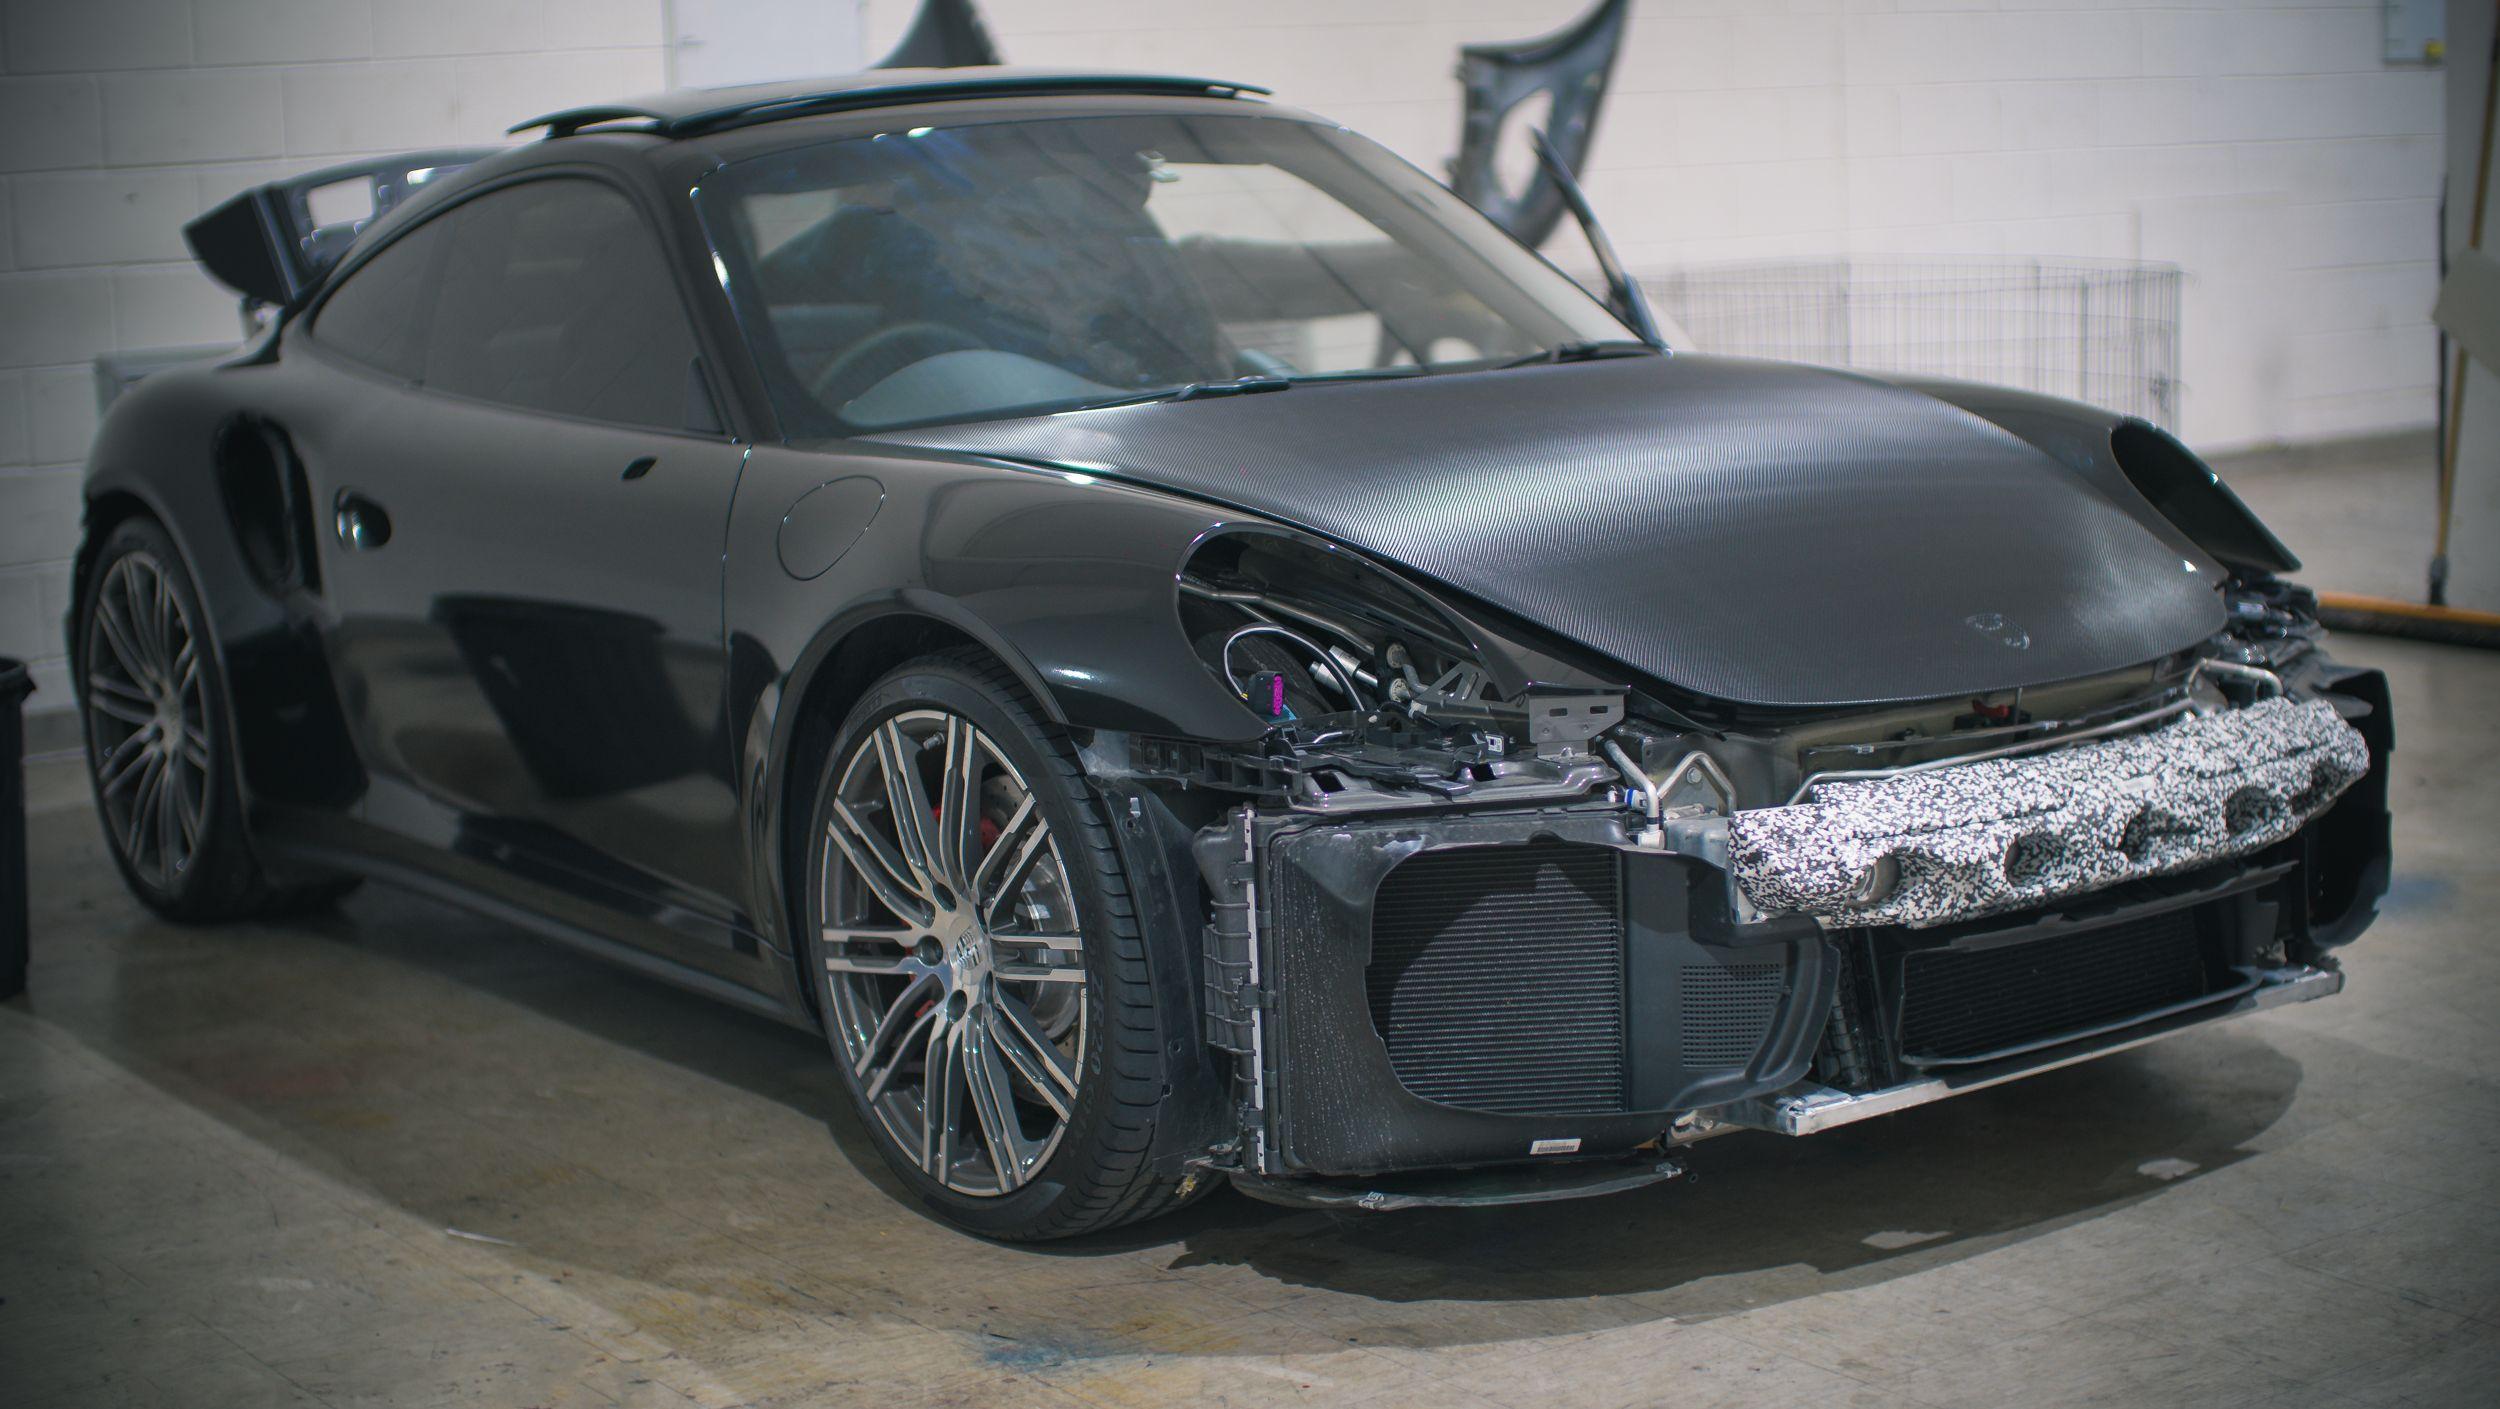 Custom black gloss wrap on this beautiful porsche car